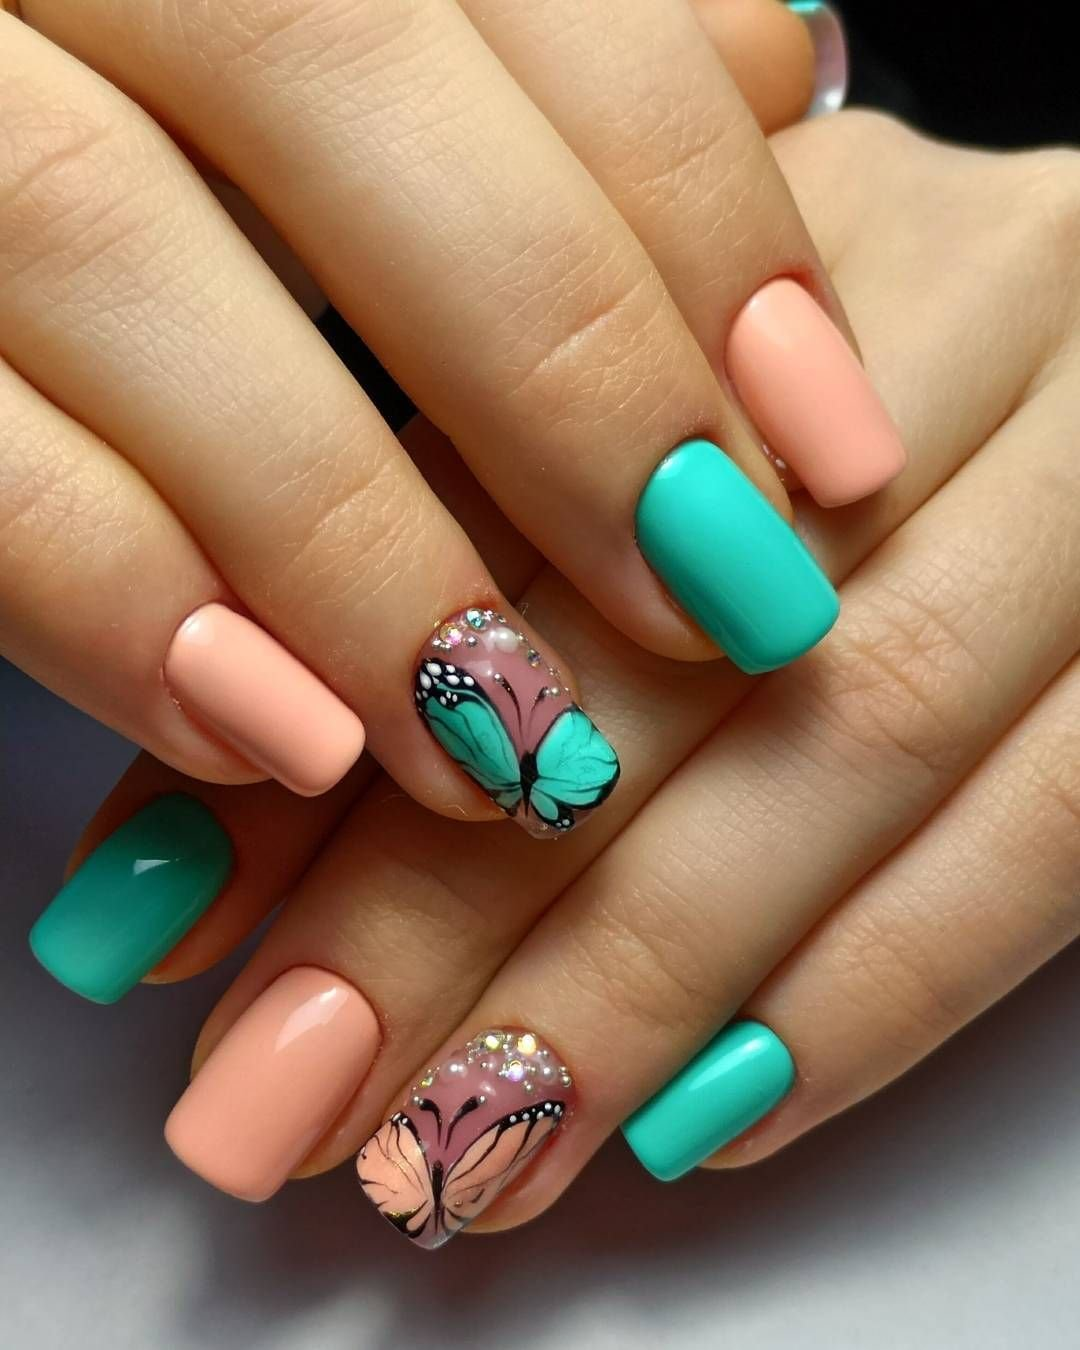 заправлял всем дизайн ногтей лето фото новинки популярностью